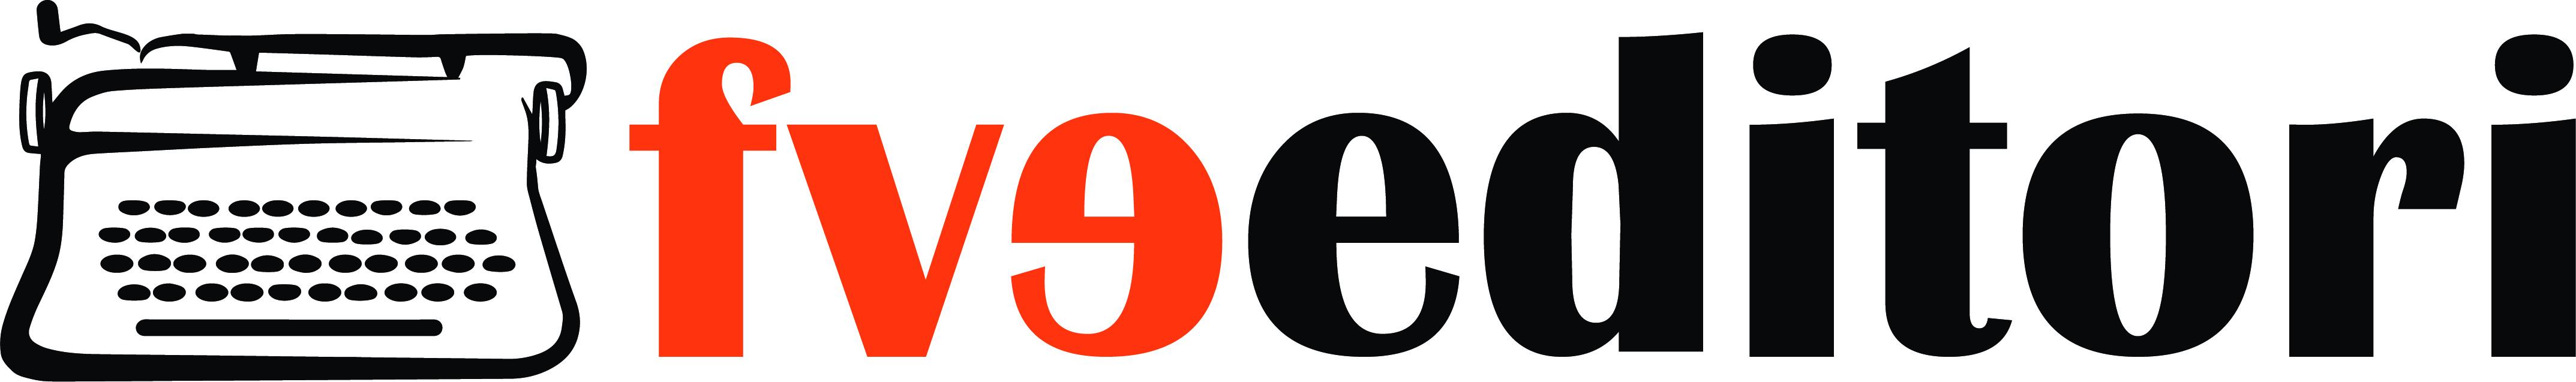 logo FVE editori final